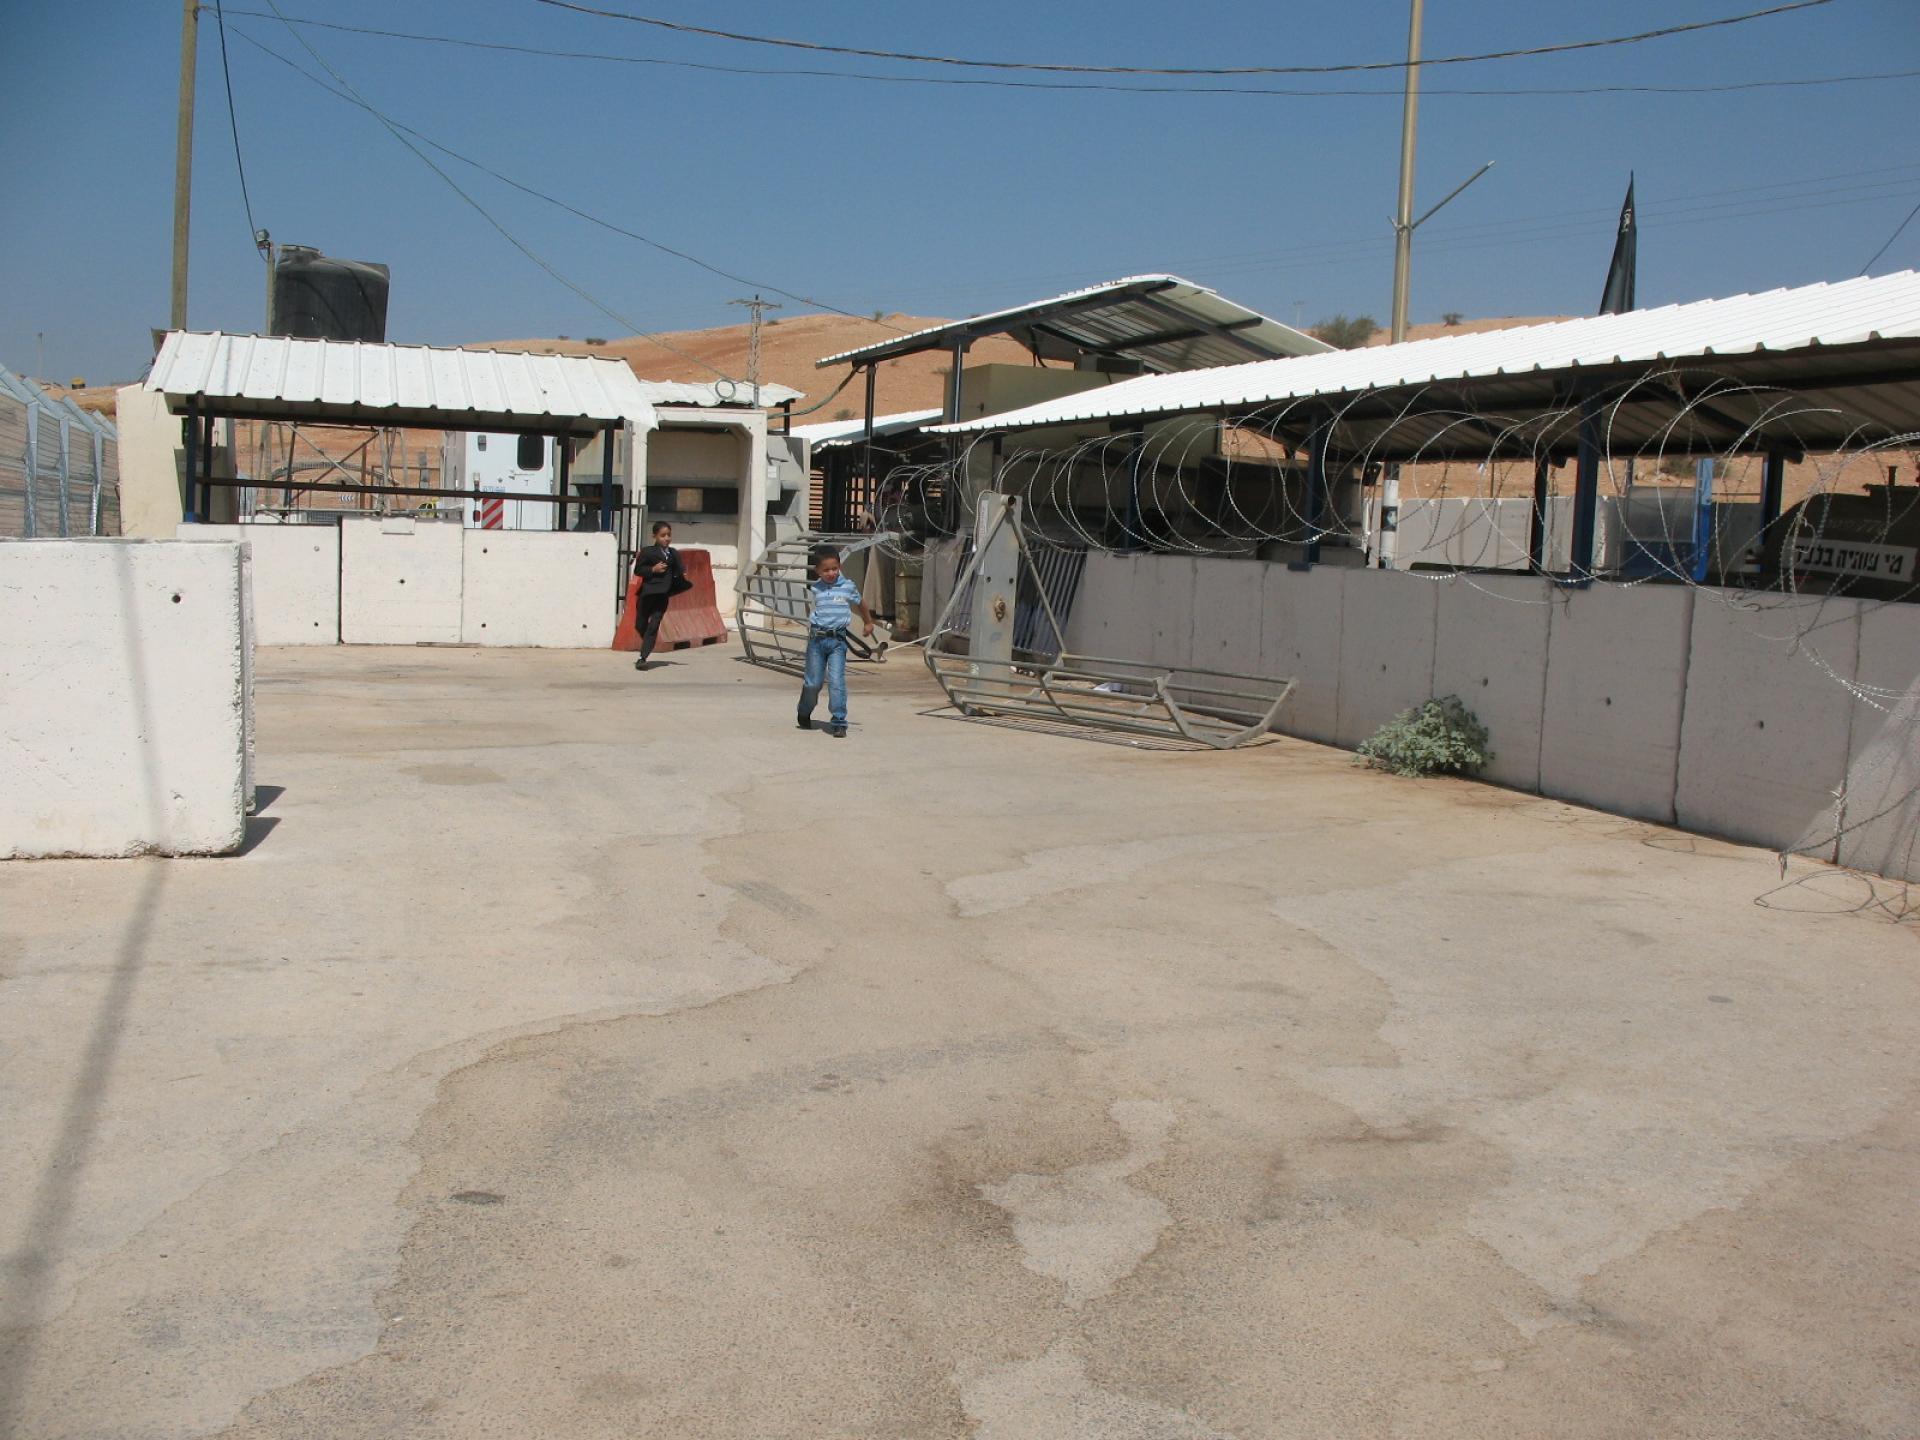 Hamra /Beqaot 10.09.10